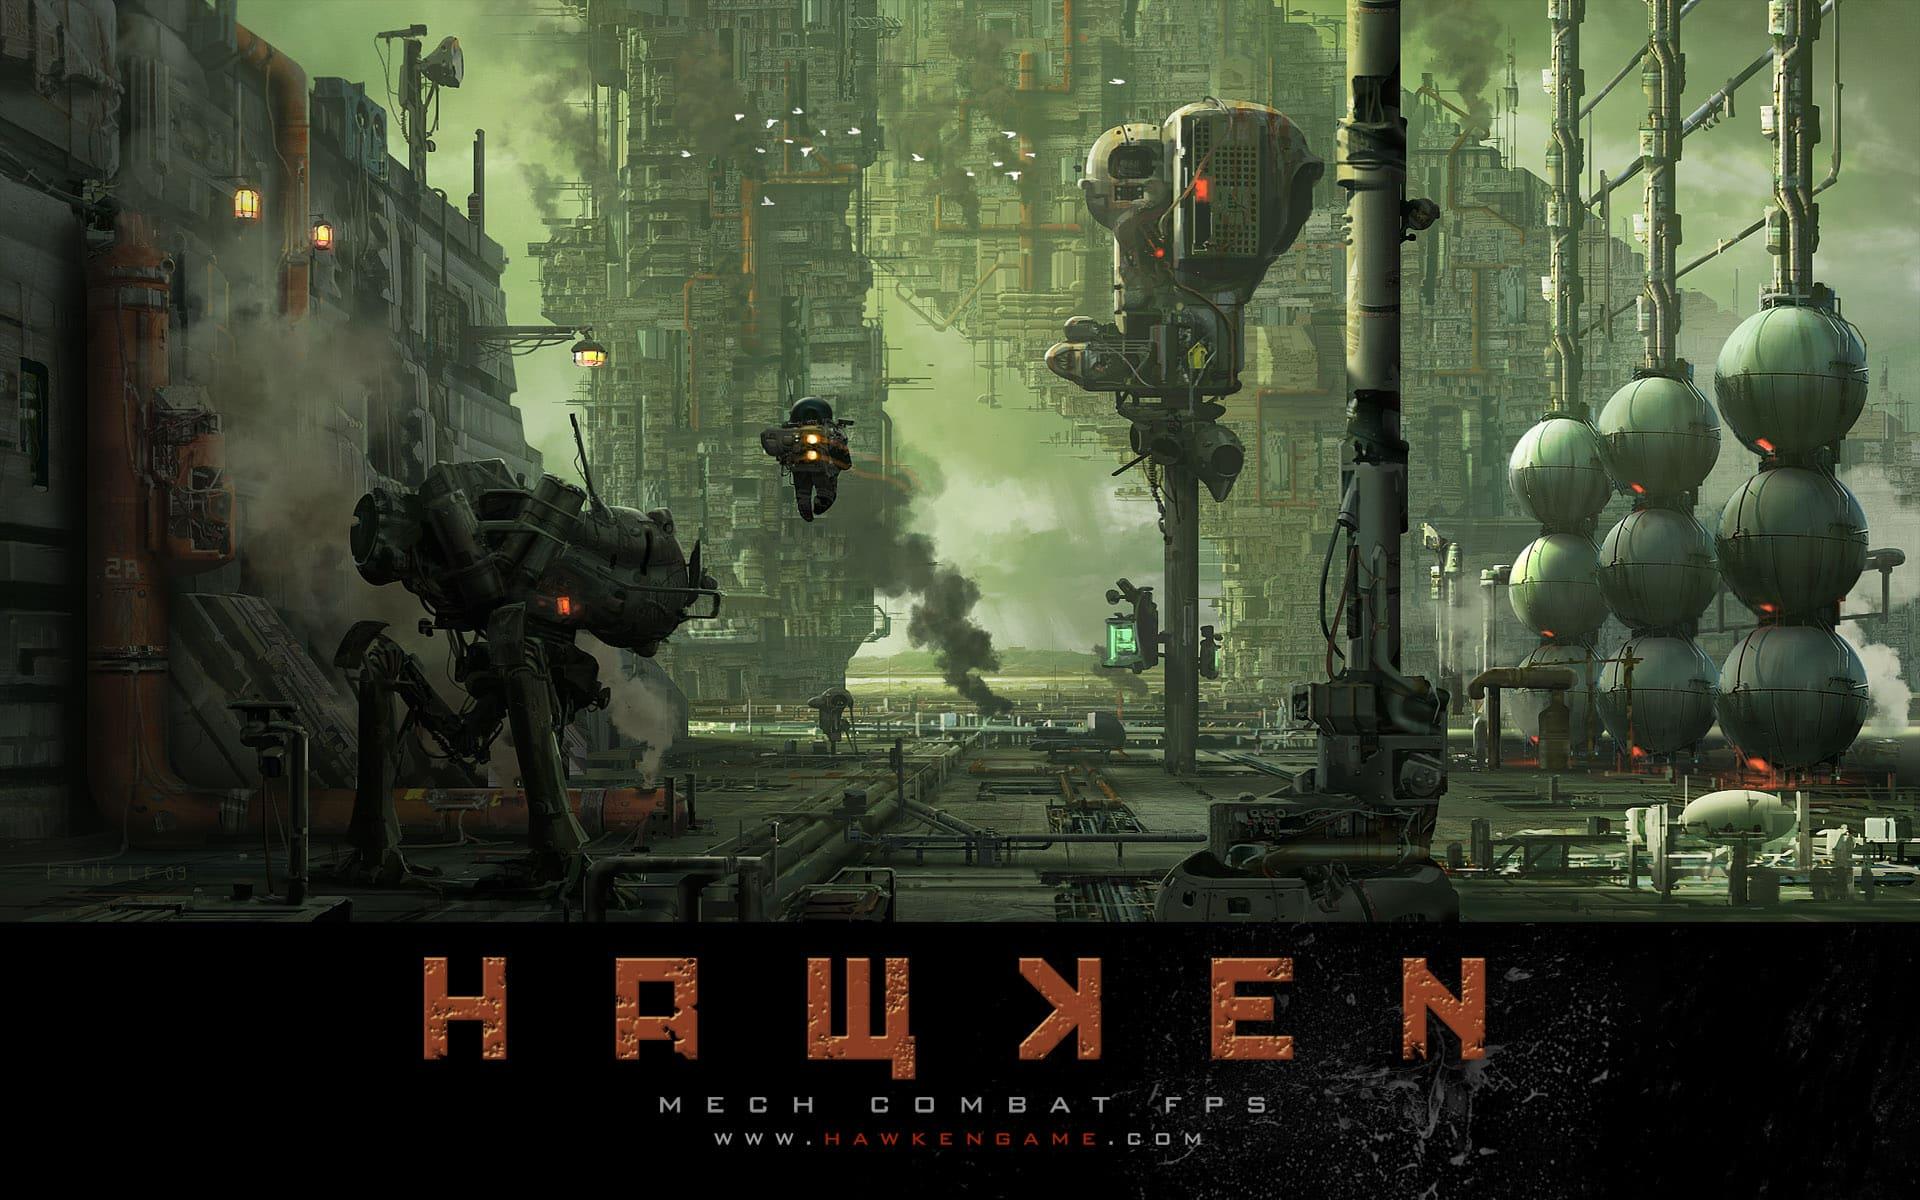 Hawken, image credit press photos